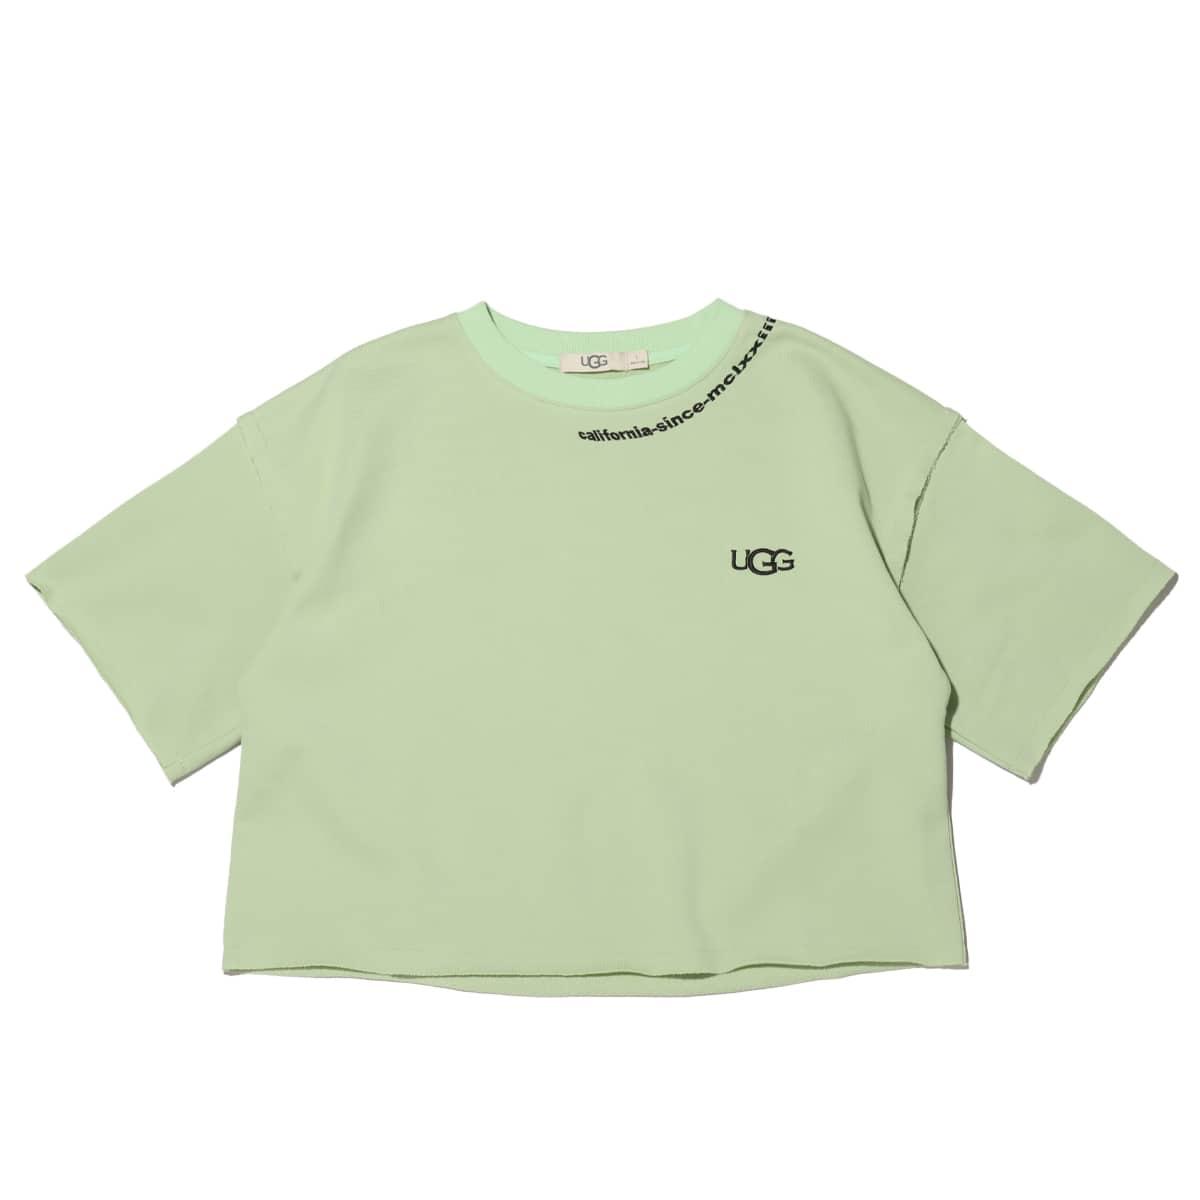 UGG 半袖 スウェットトップス GREEN 21SS-I_photo_large